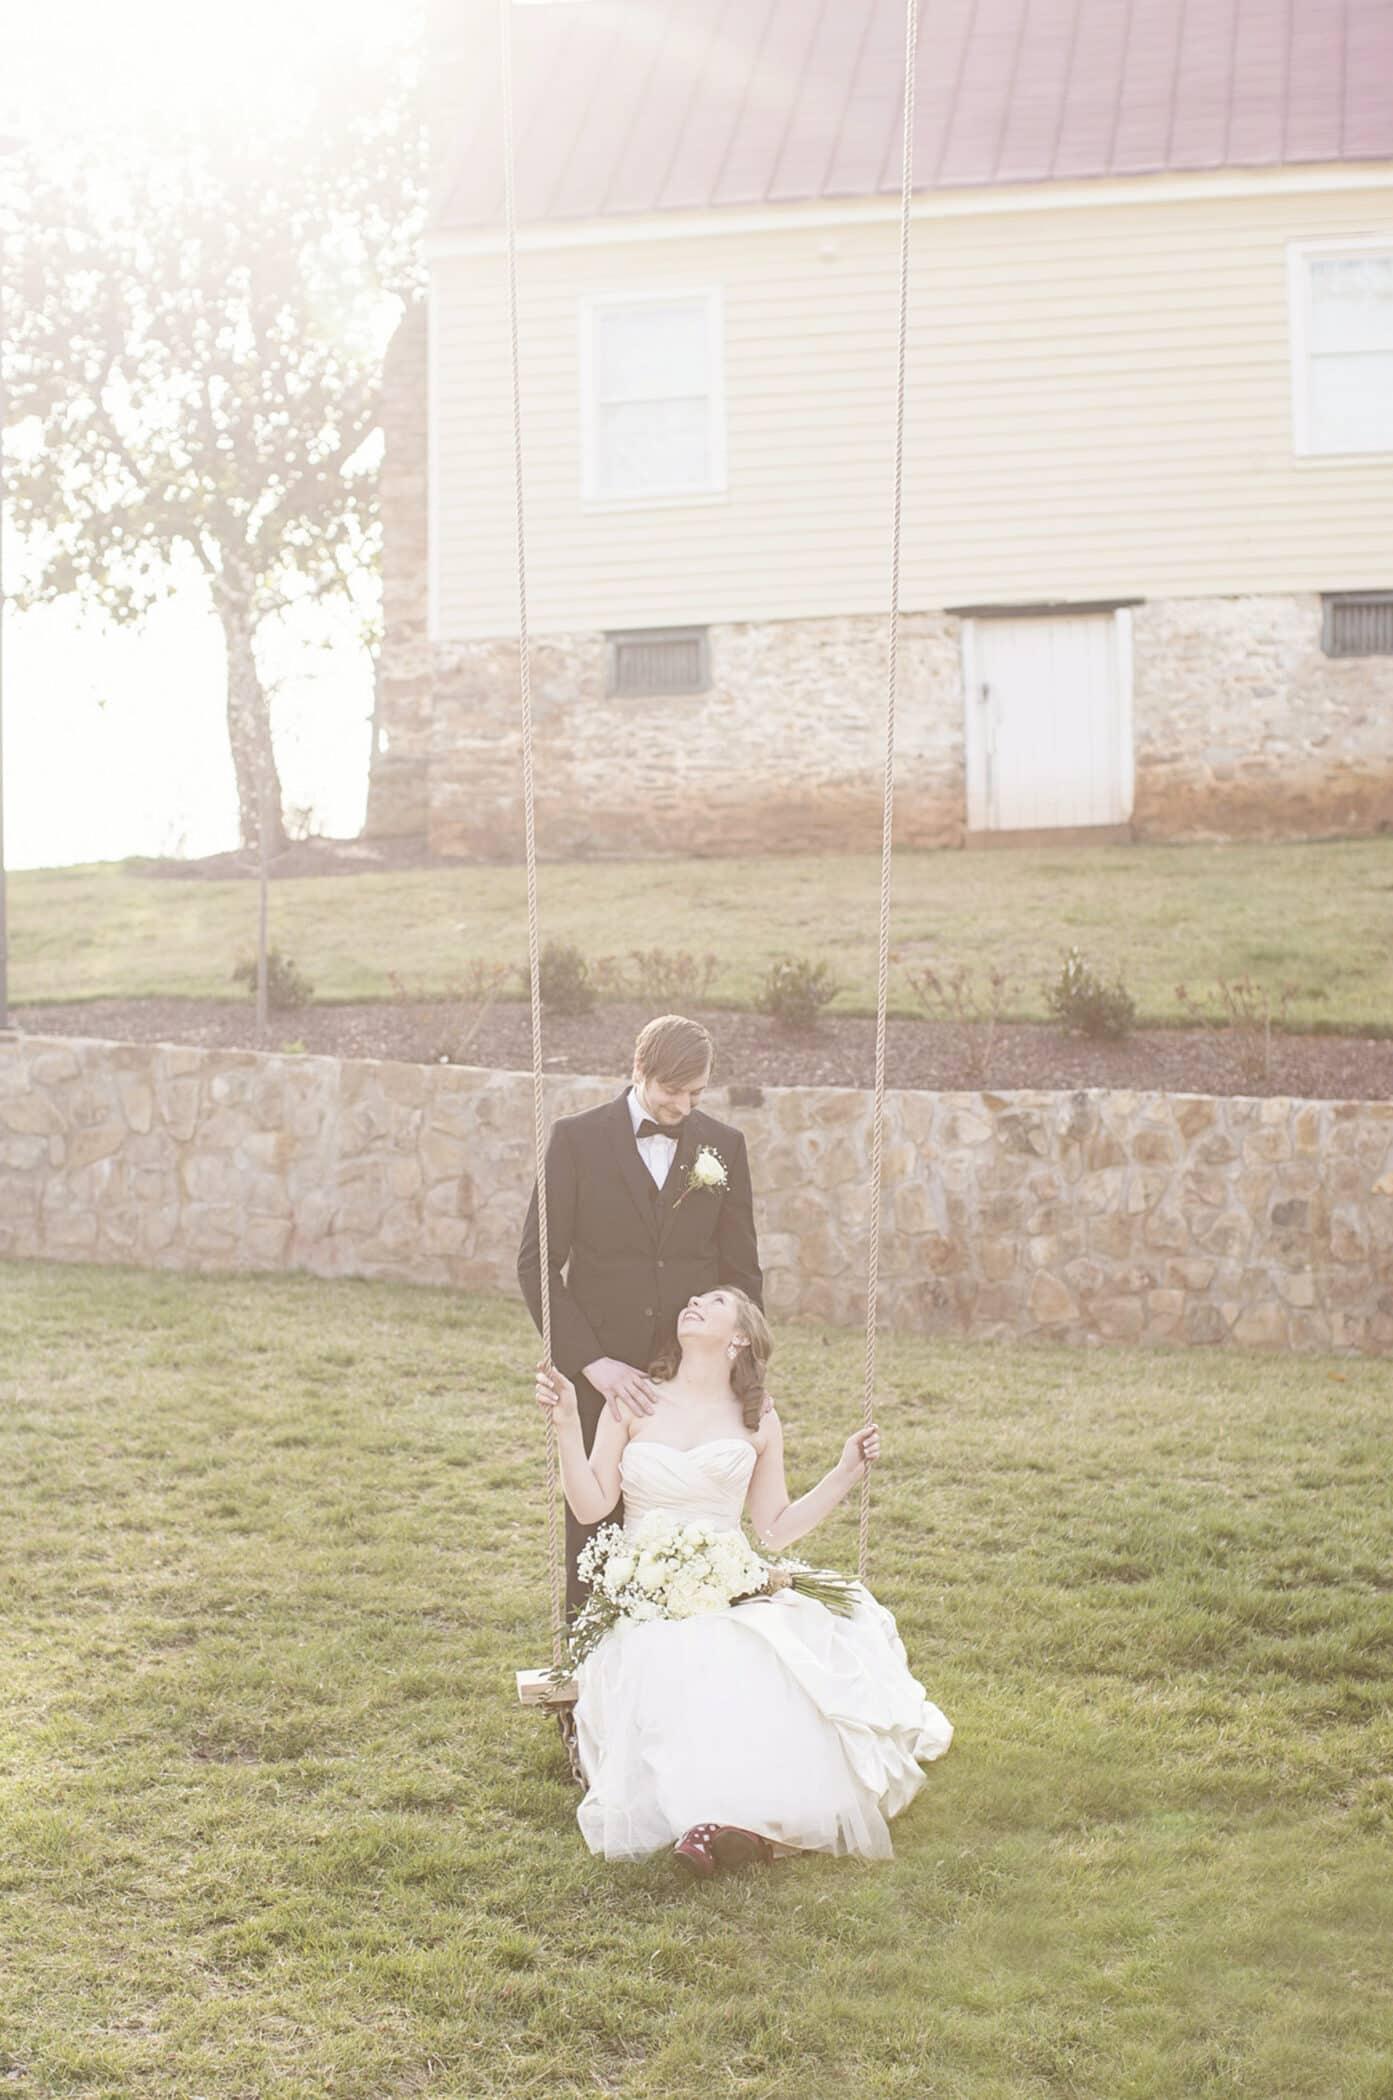 Selecting Your Virginia Wedding Venue | Entwined Events | Venue: Bella Rose Plantation in Lynchburg, VA | Photo Credit: Kidd Photography